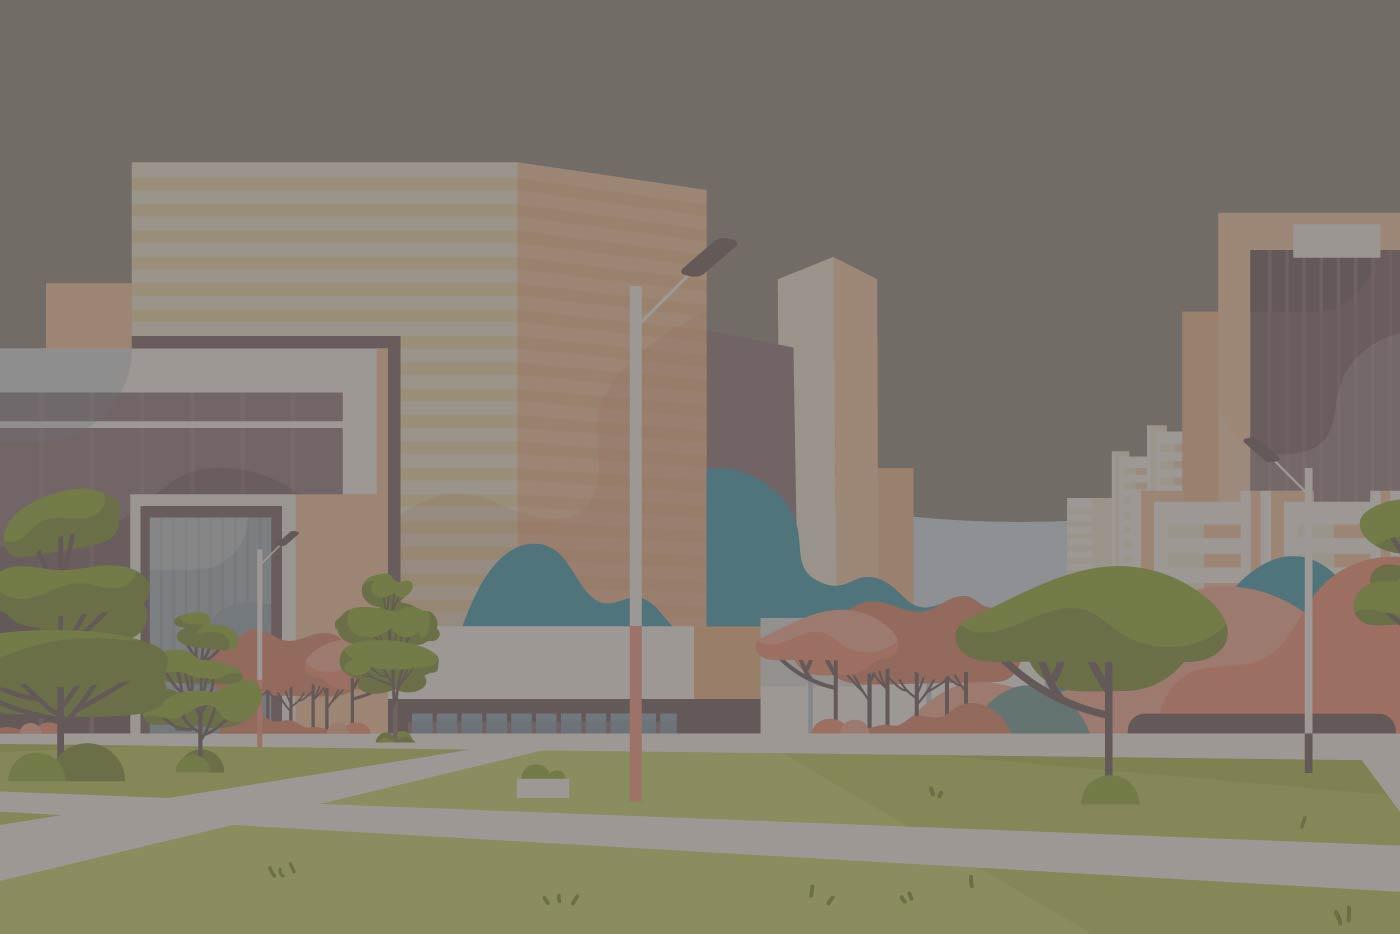 Architecture - Urban design